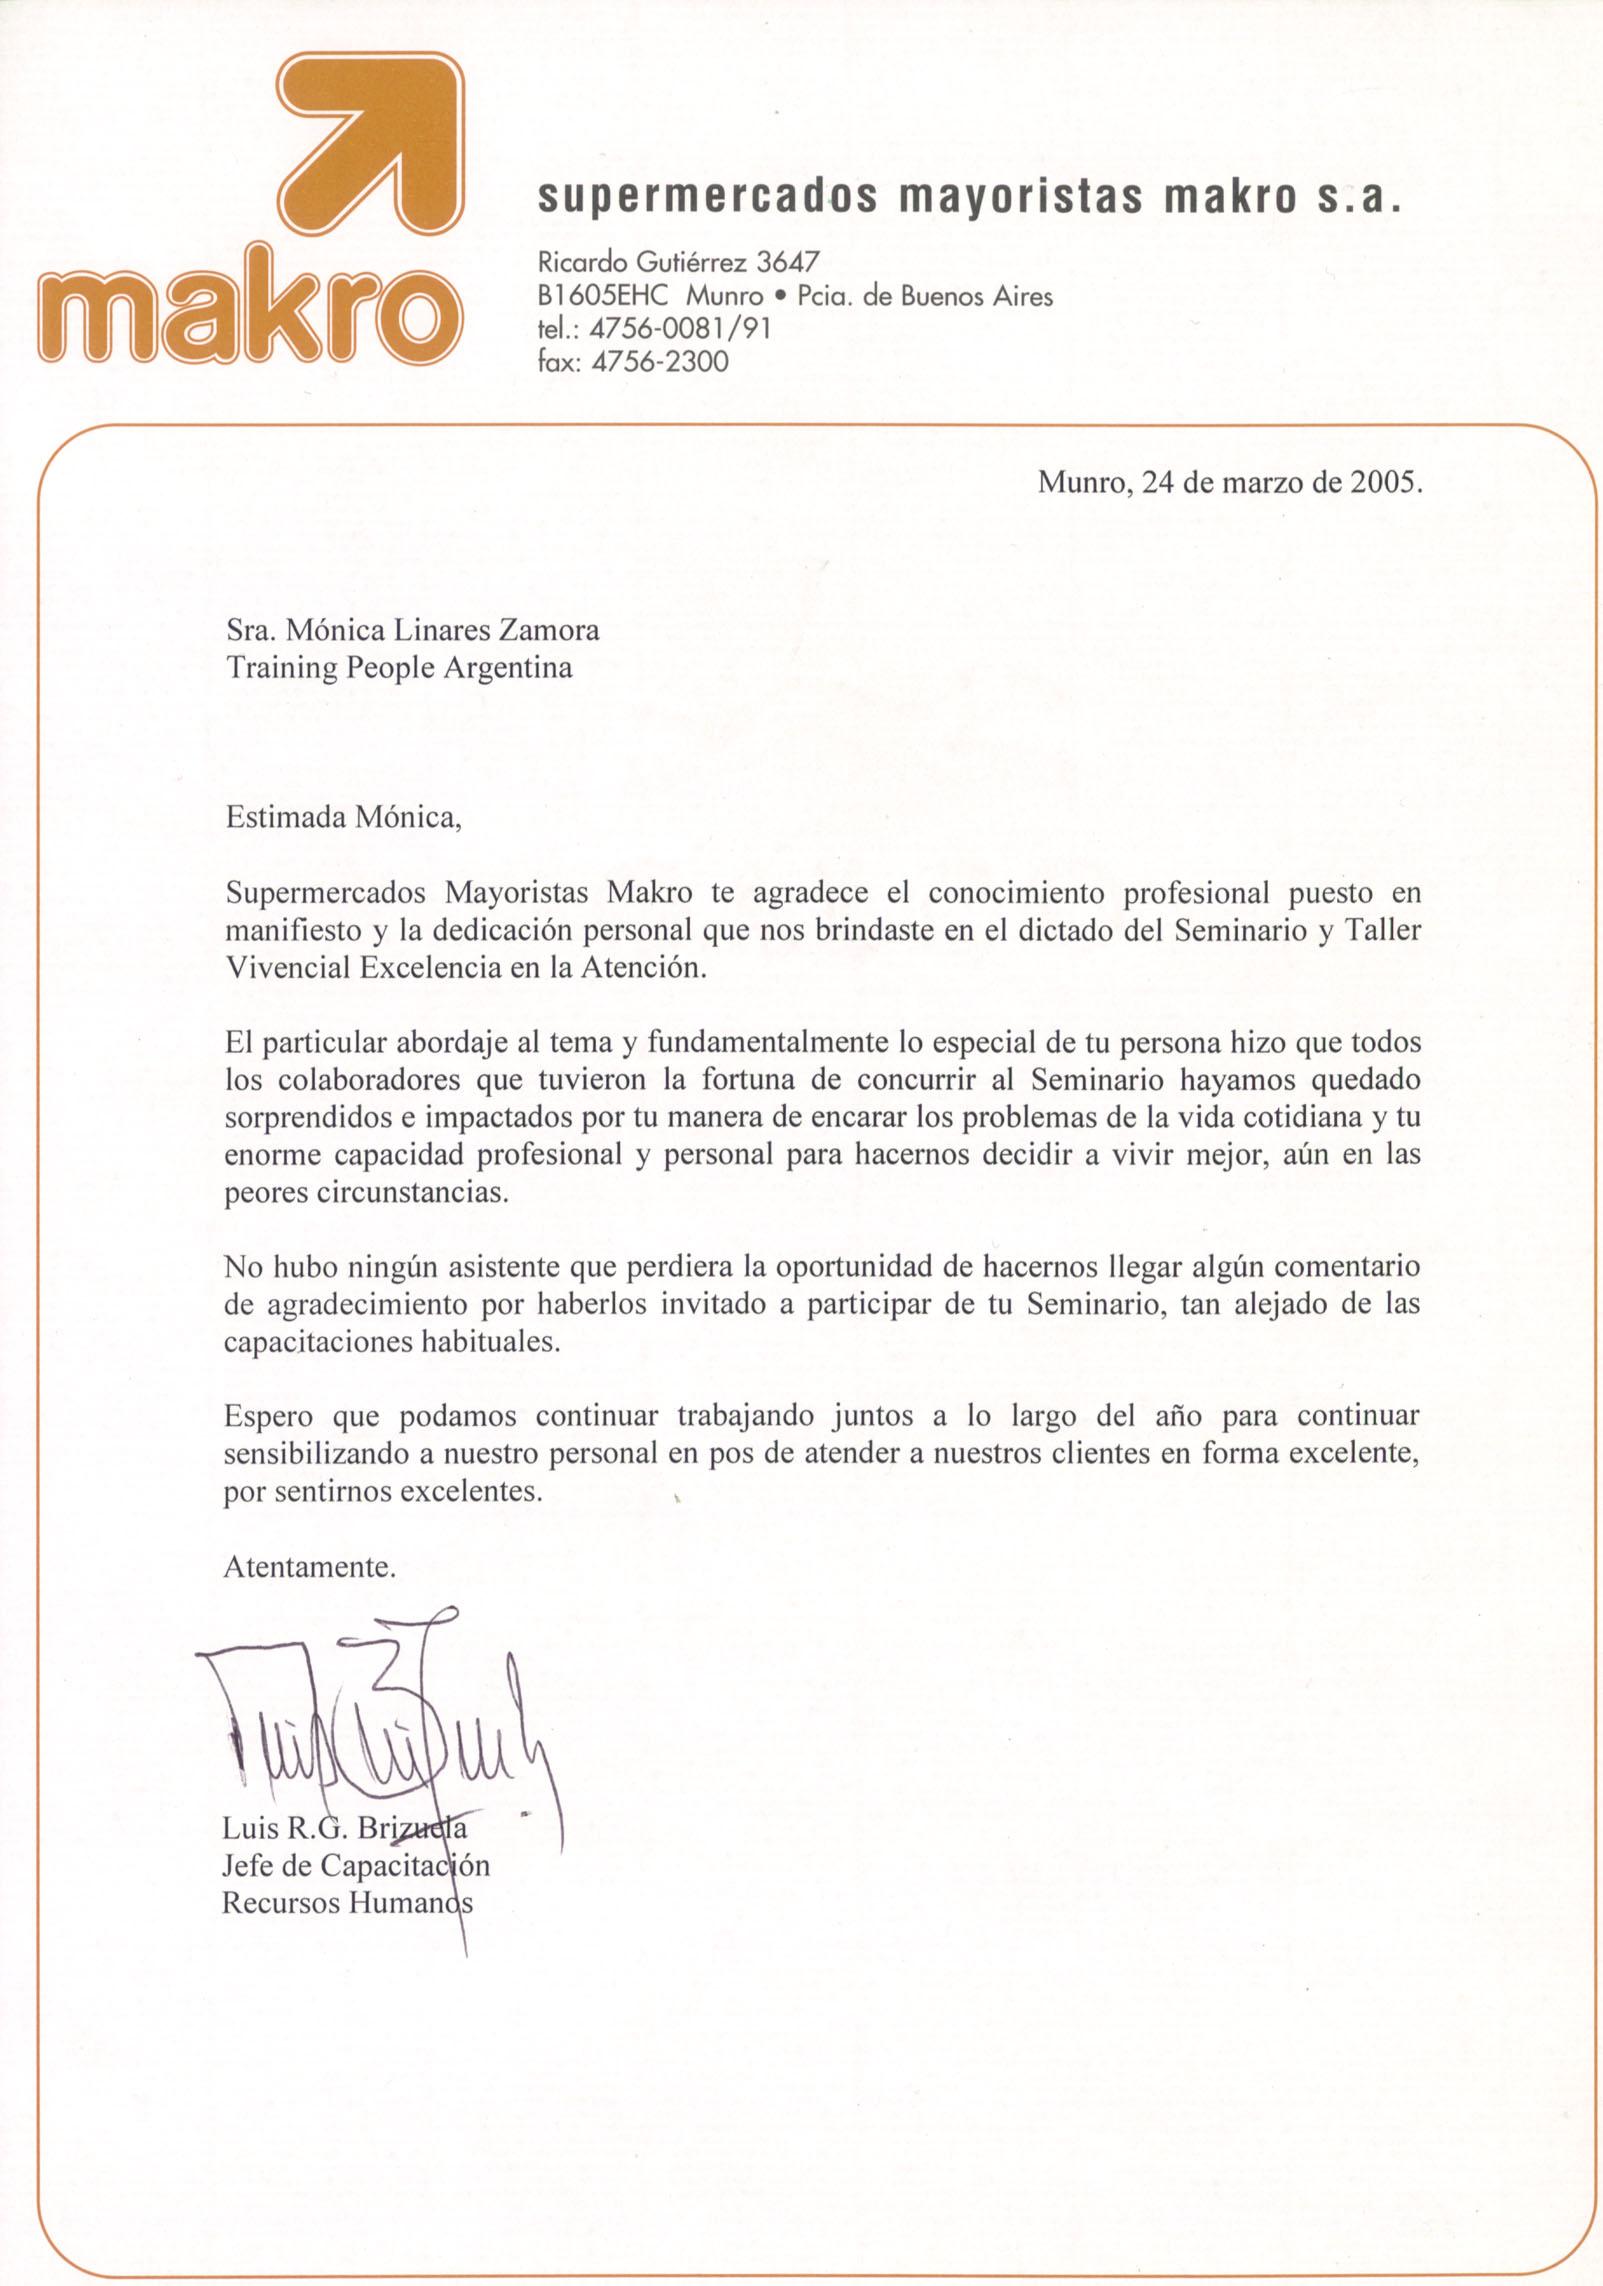 5_REFERENCIA_MAKRO